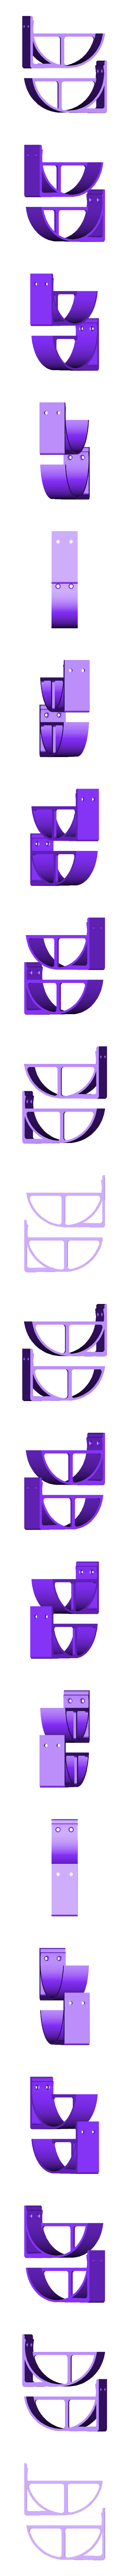 Rc Car wall mount d=84mm.stl Download free STL file Rc Car wall mount • 3D print template, DB46